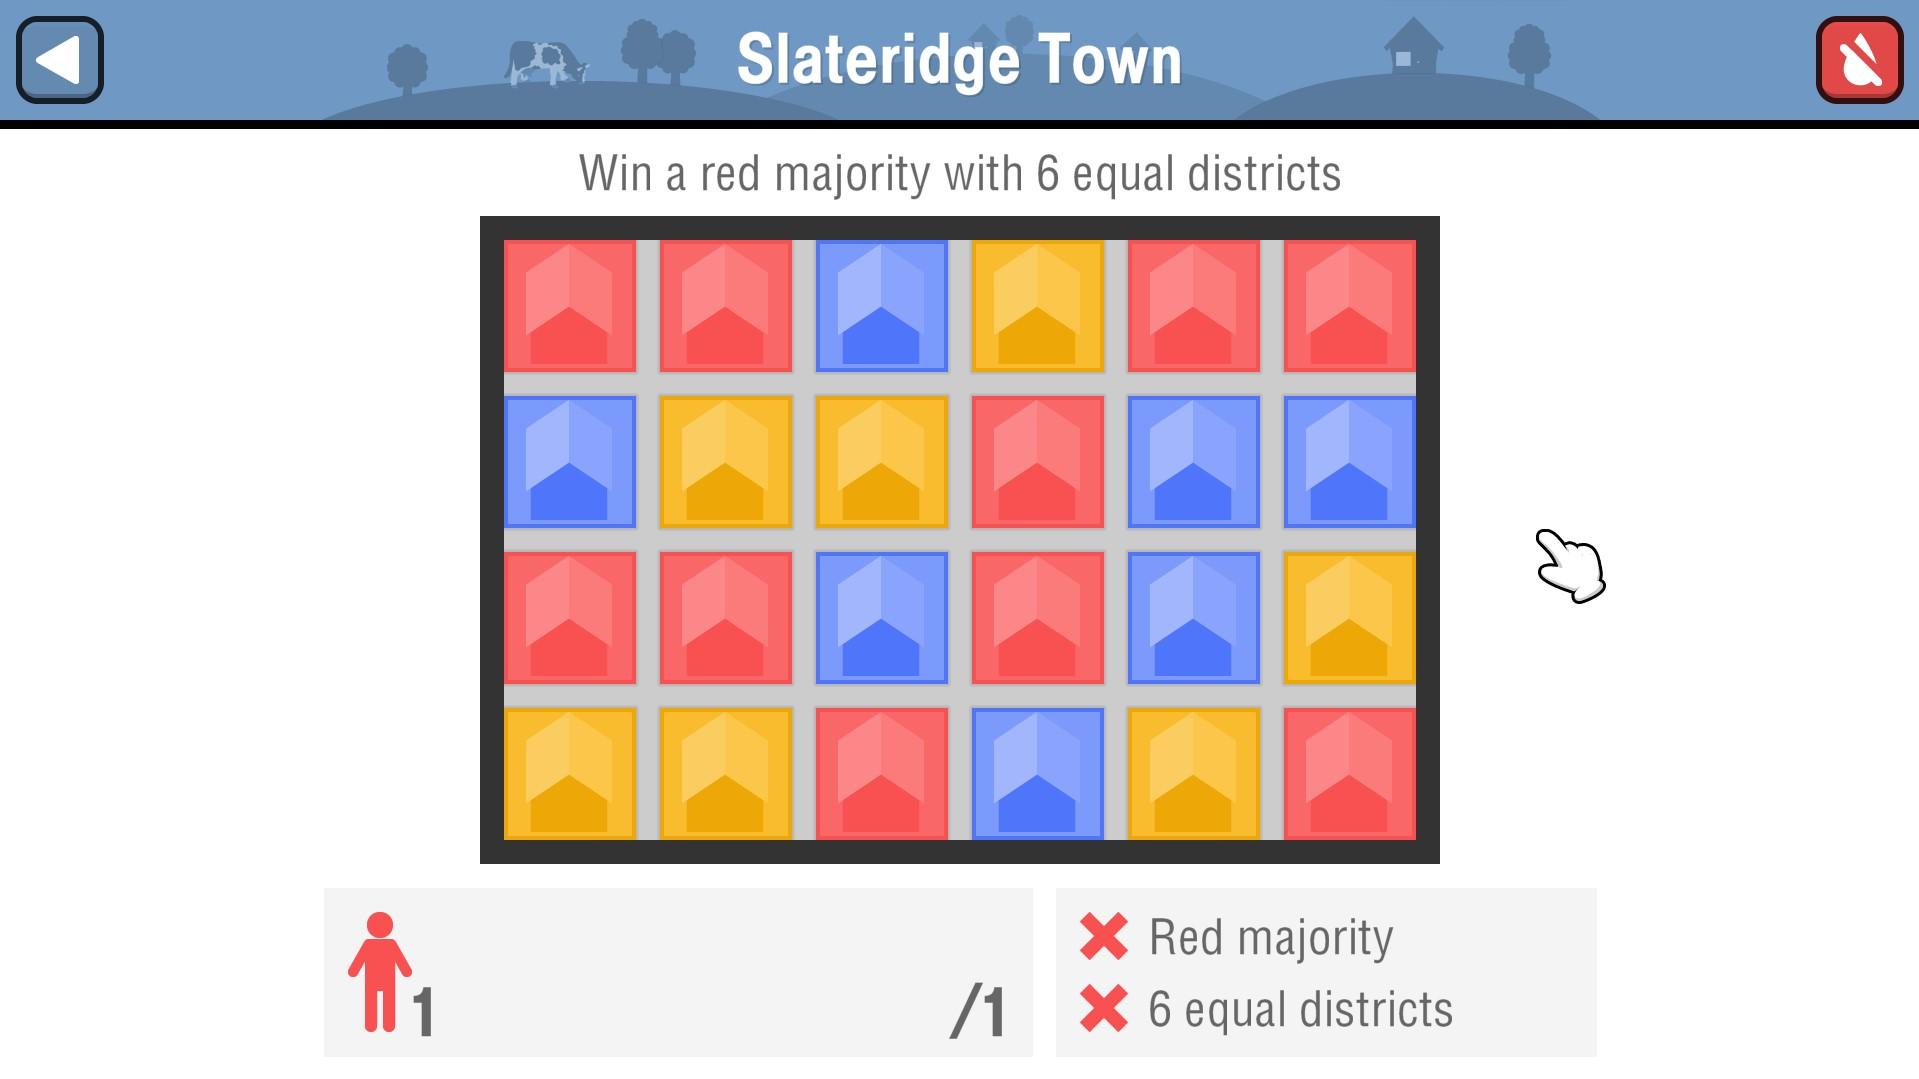 Slateridge Town